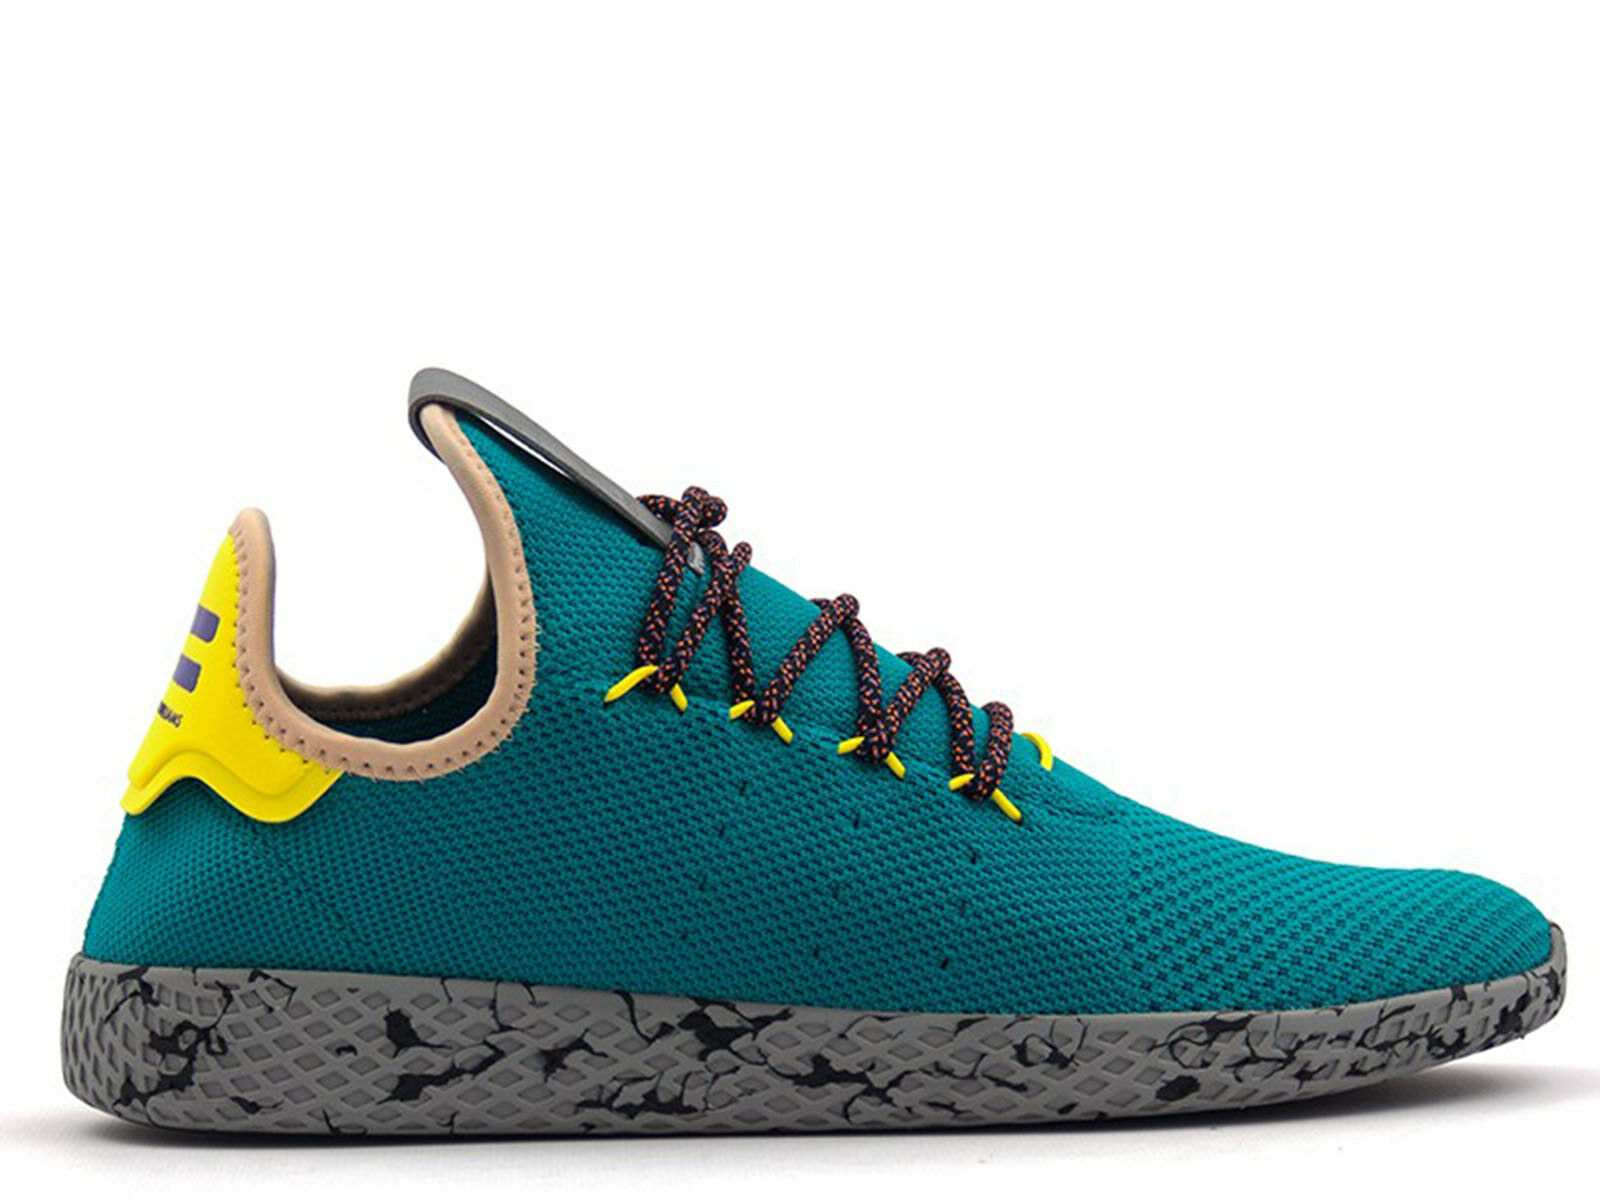 promo code 37631 f7909 Uomini nuovi di zecca adidas pw tennis hu